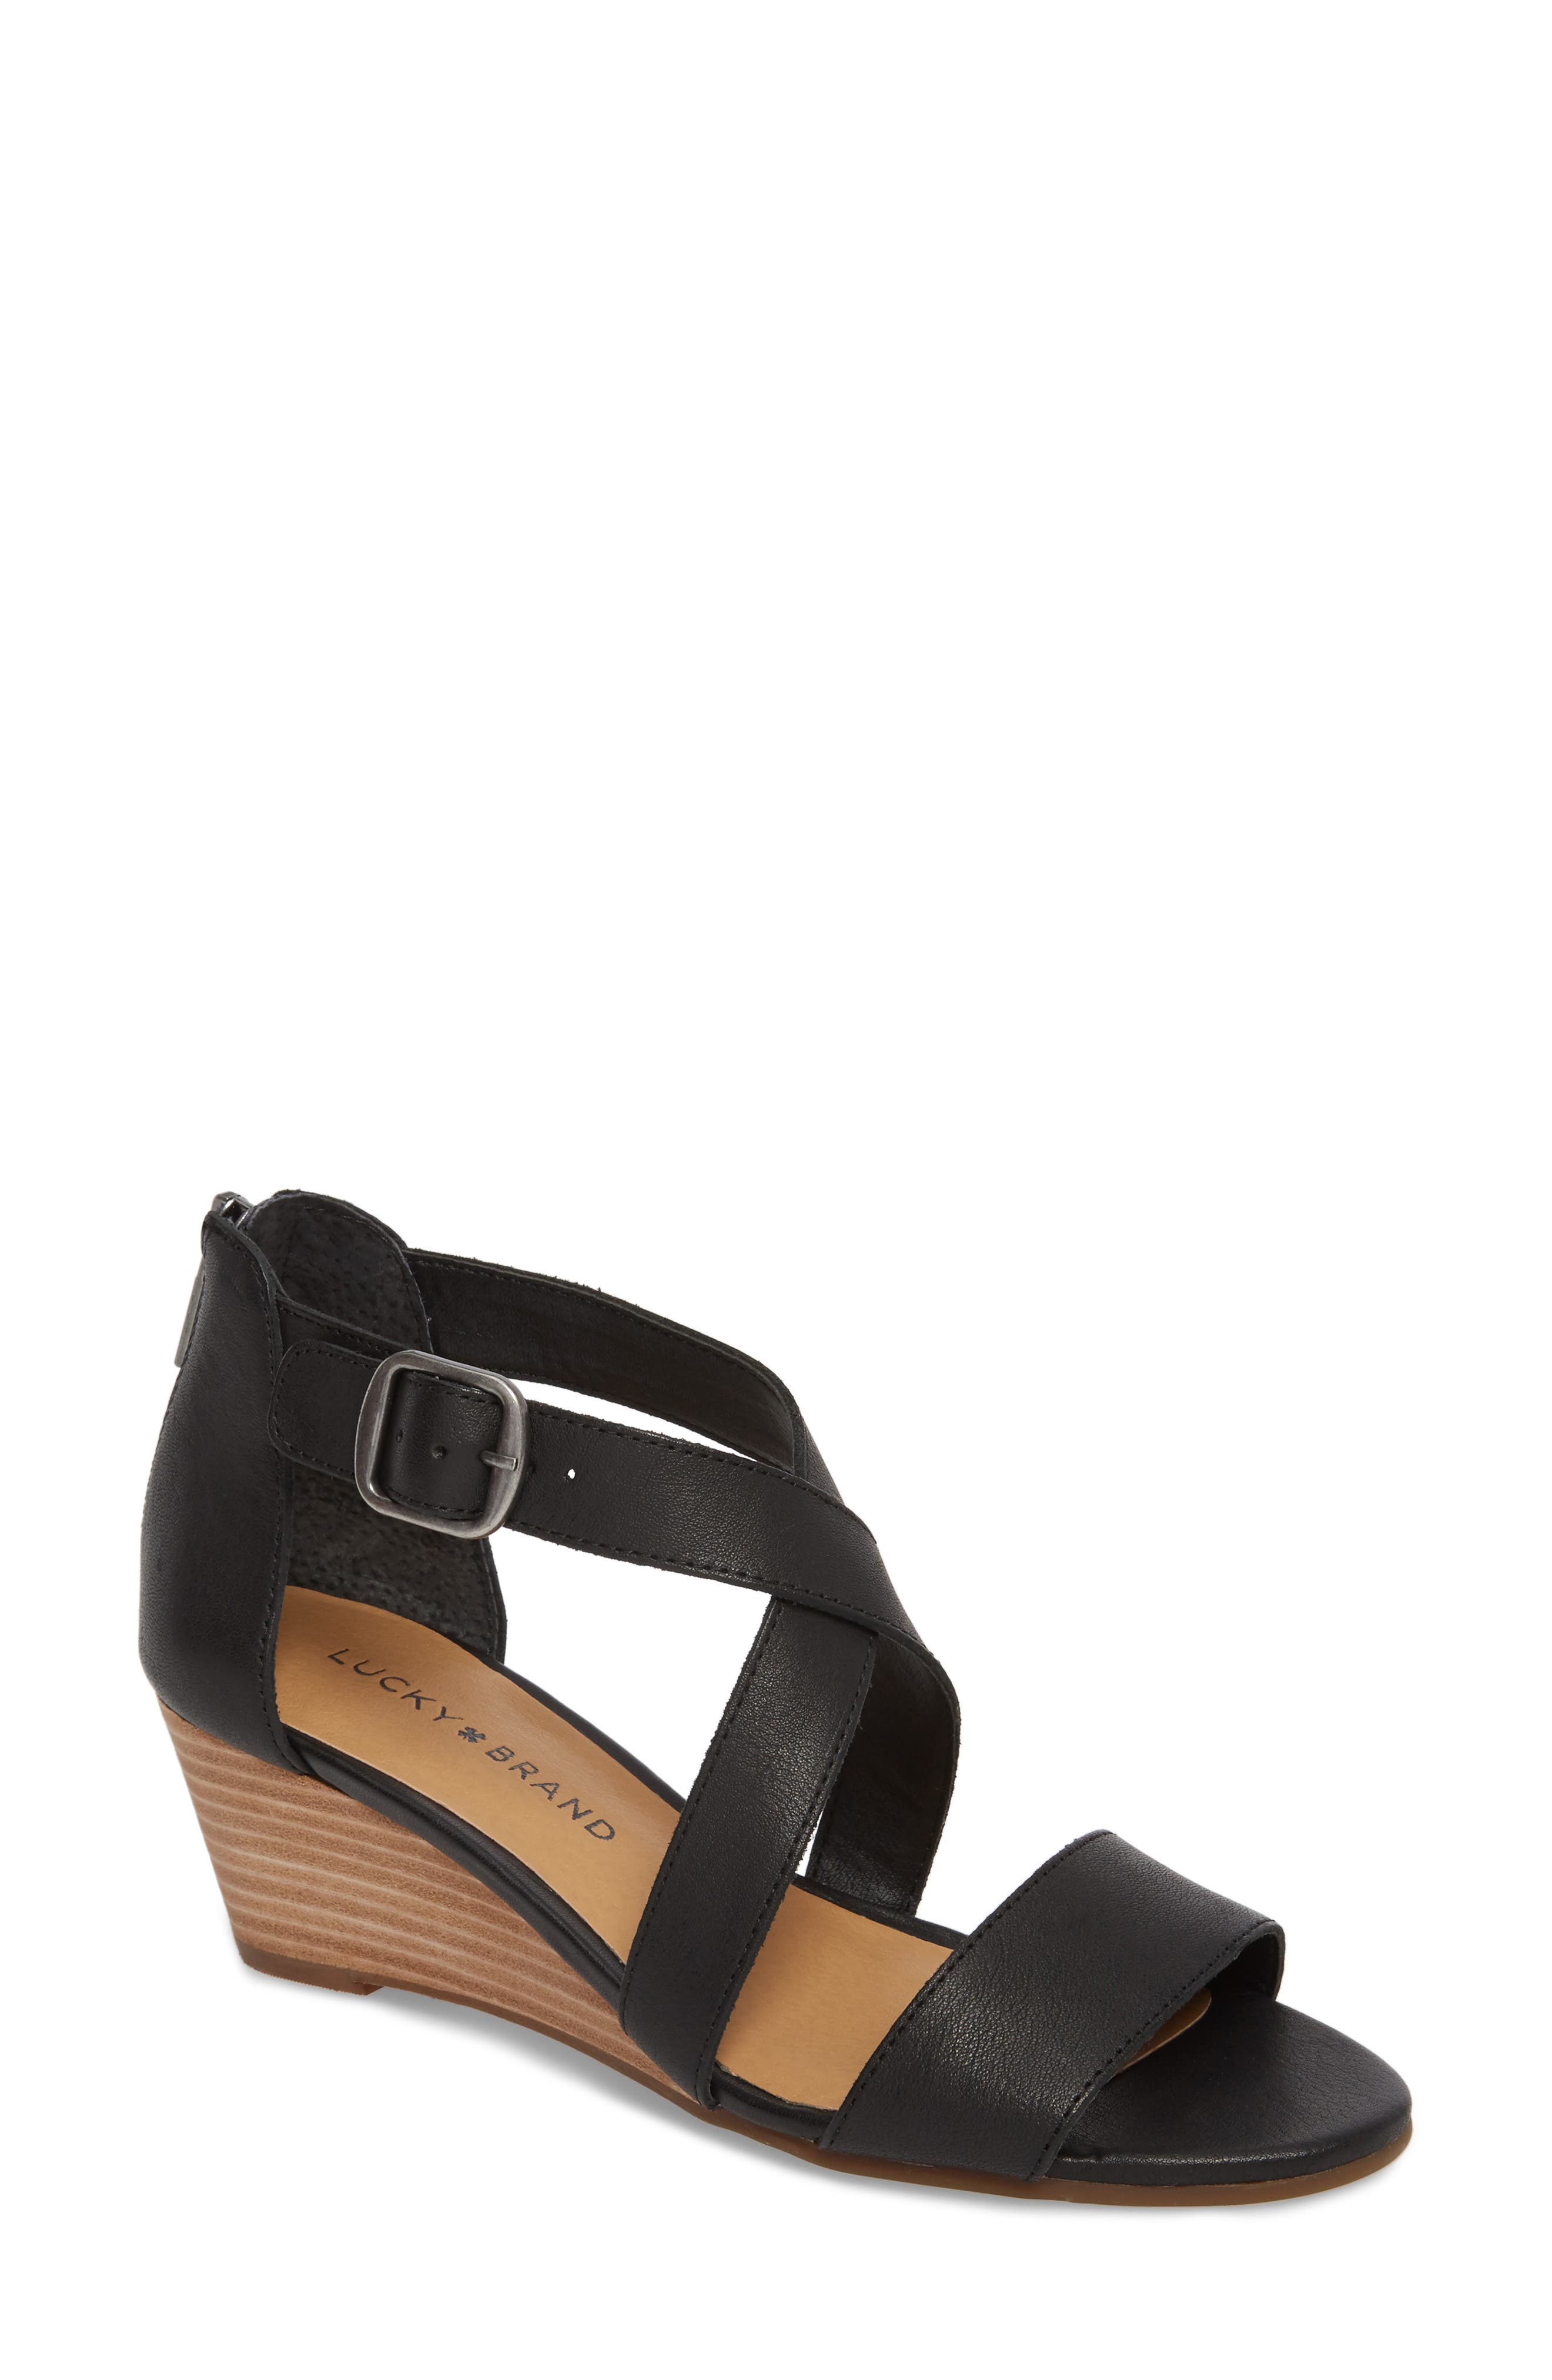 Jestah Wedge Sandal,                         Main,                         color, BLACK LEATHER